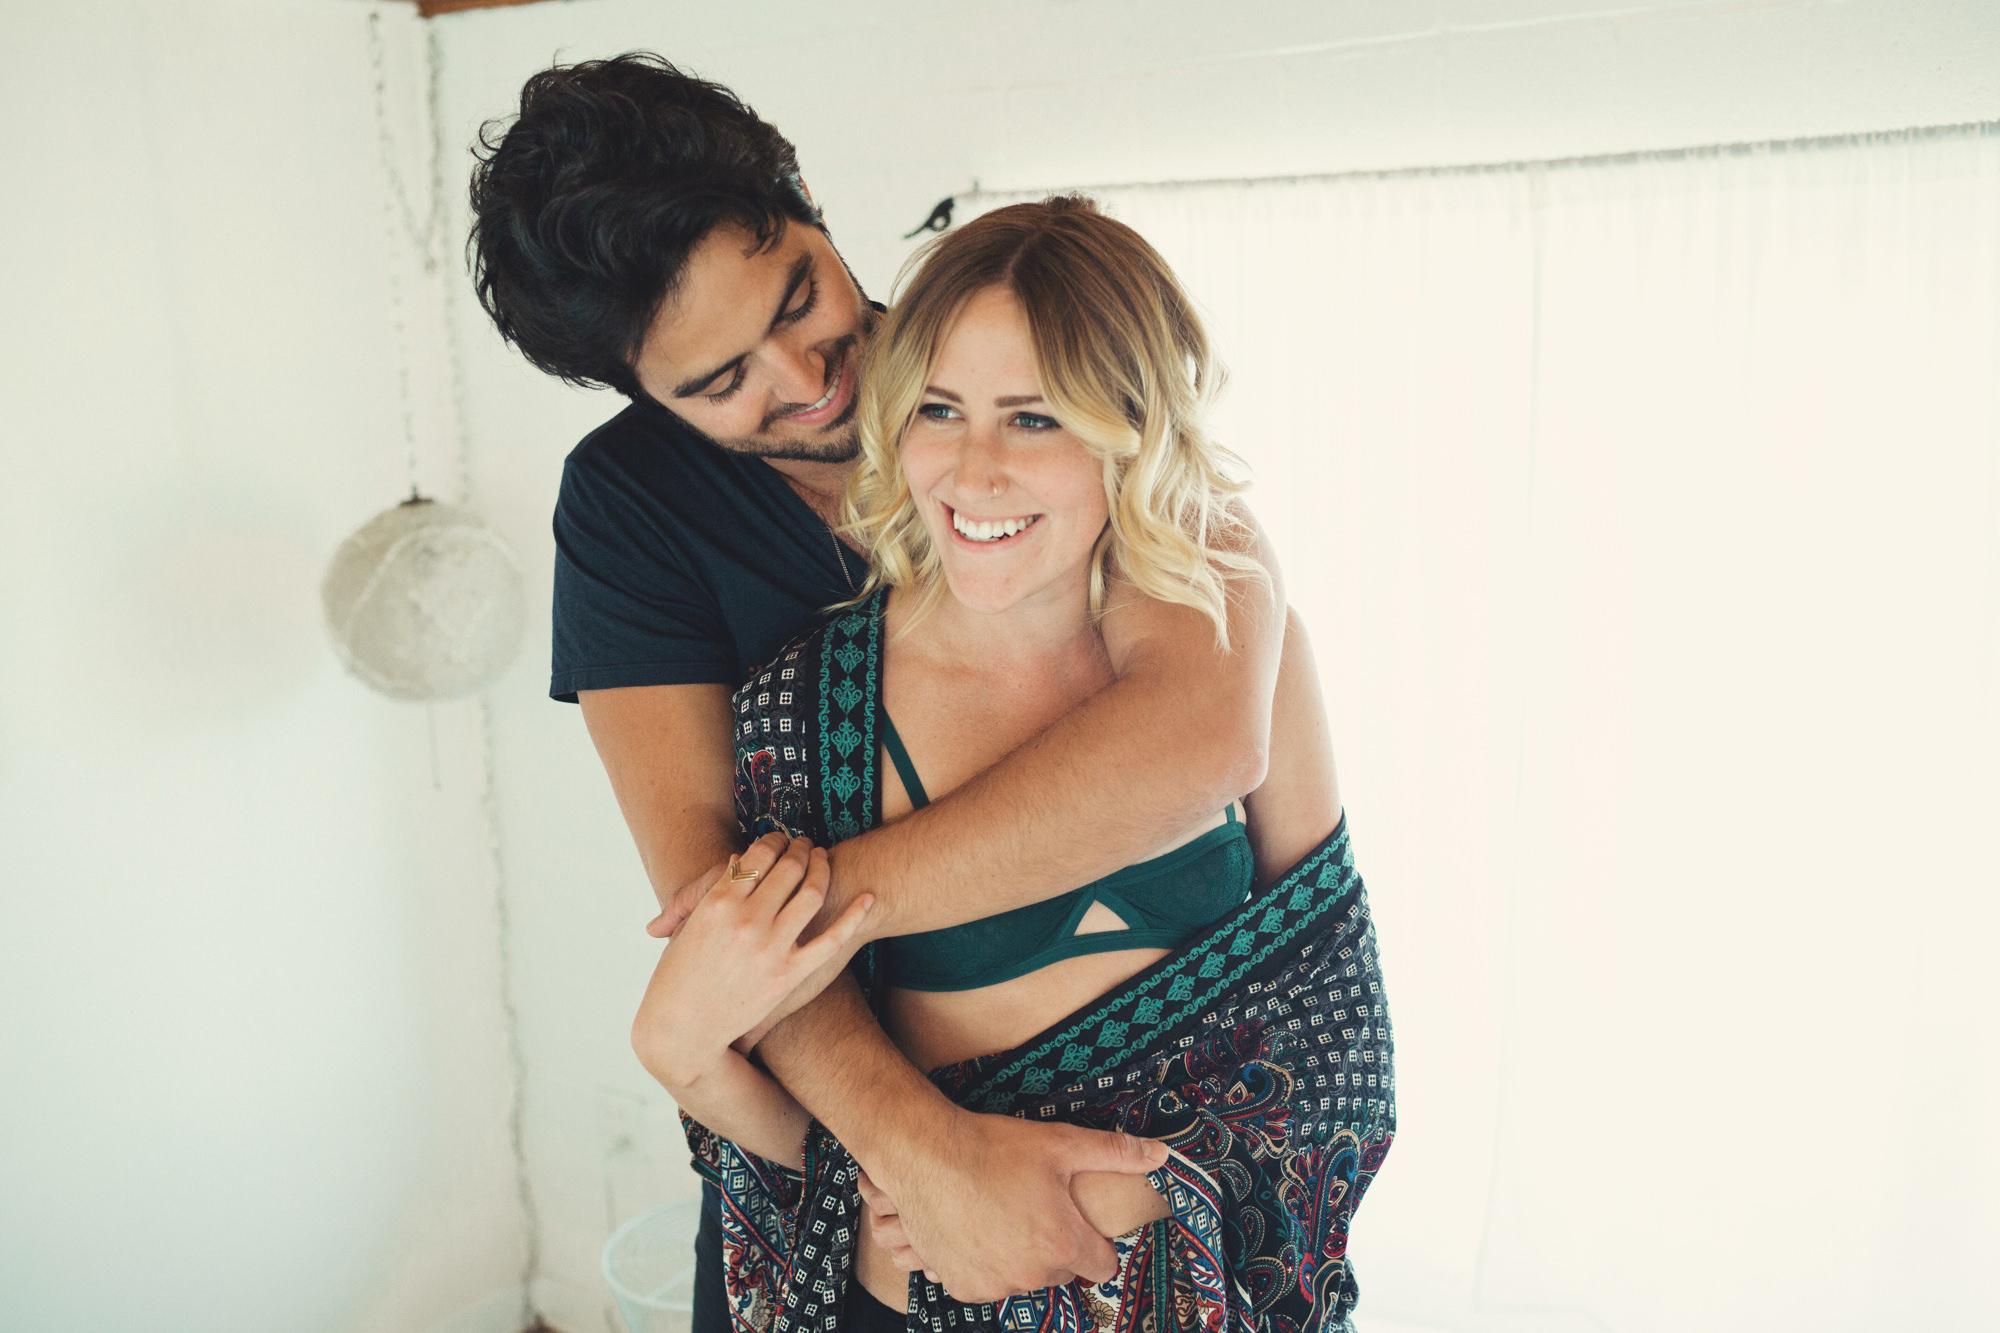 Intimate Couple Session@Anne-Claire Brun 36